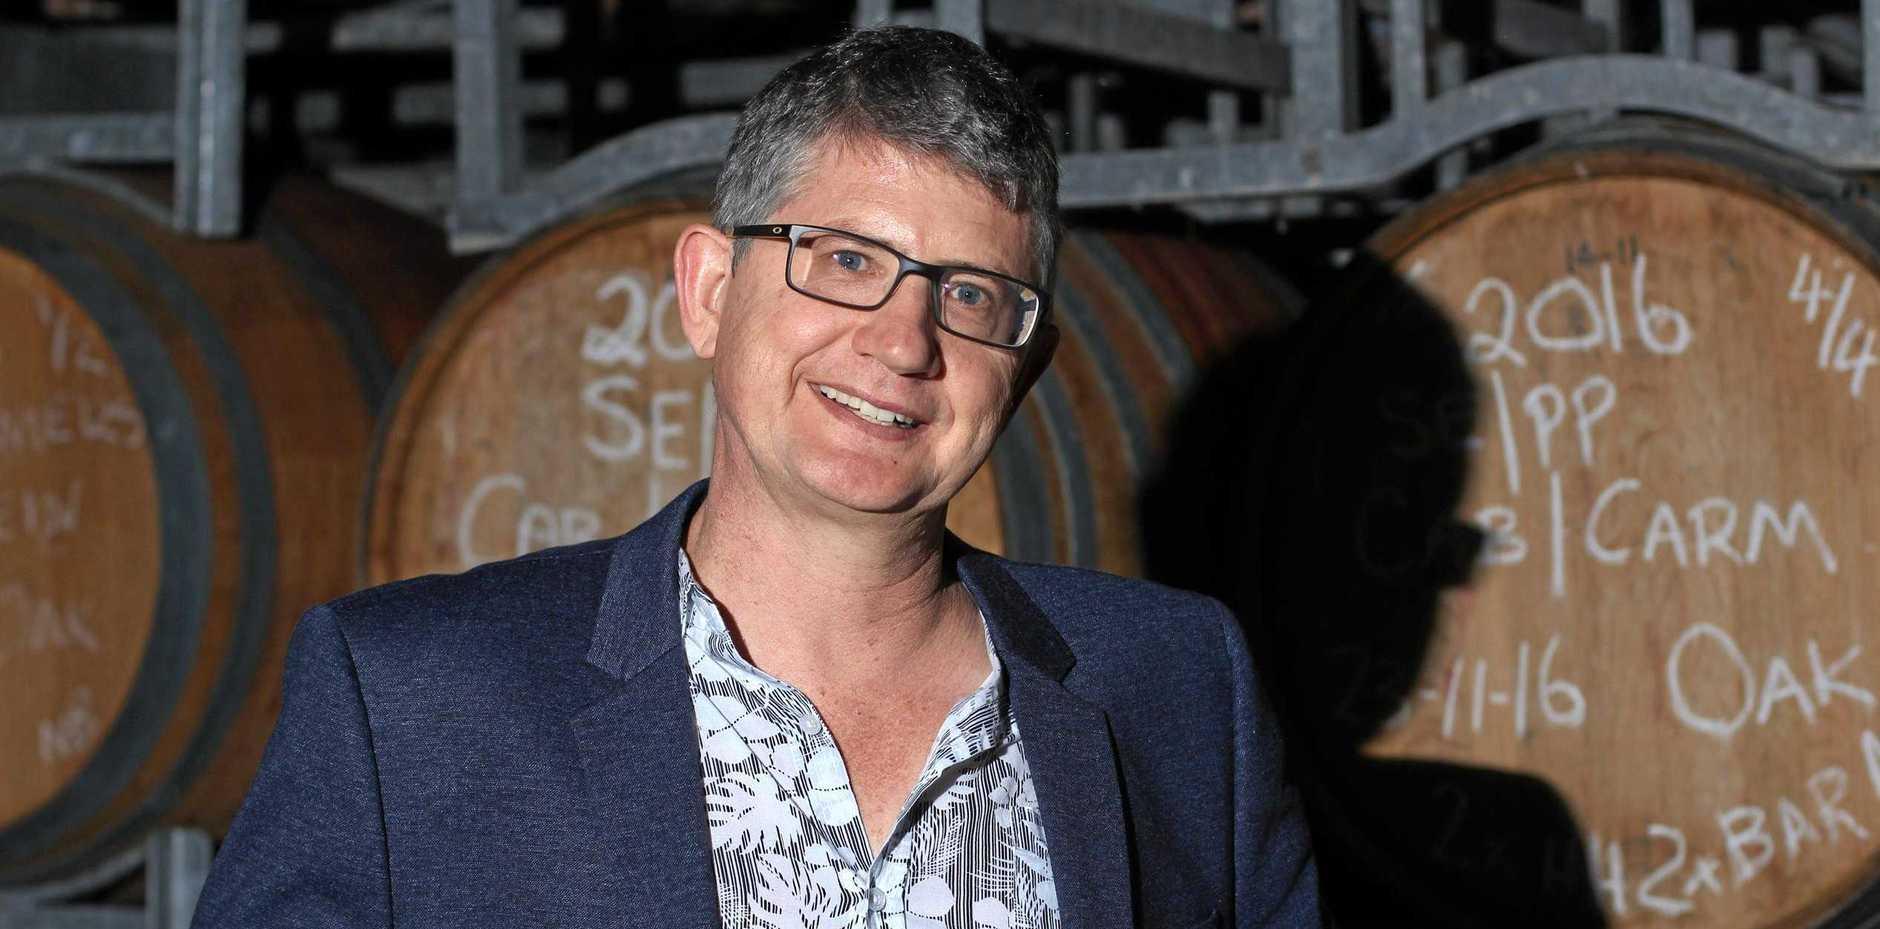 Symphony Hill Wines owner Ewen Macpherson.